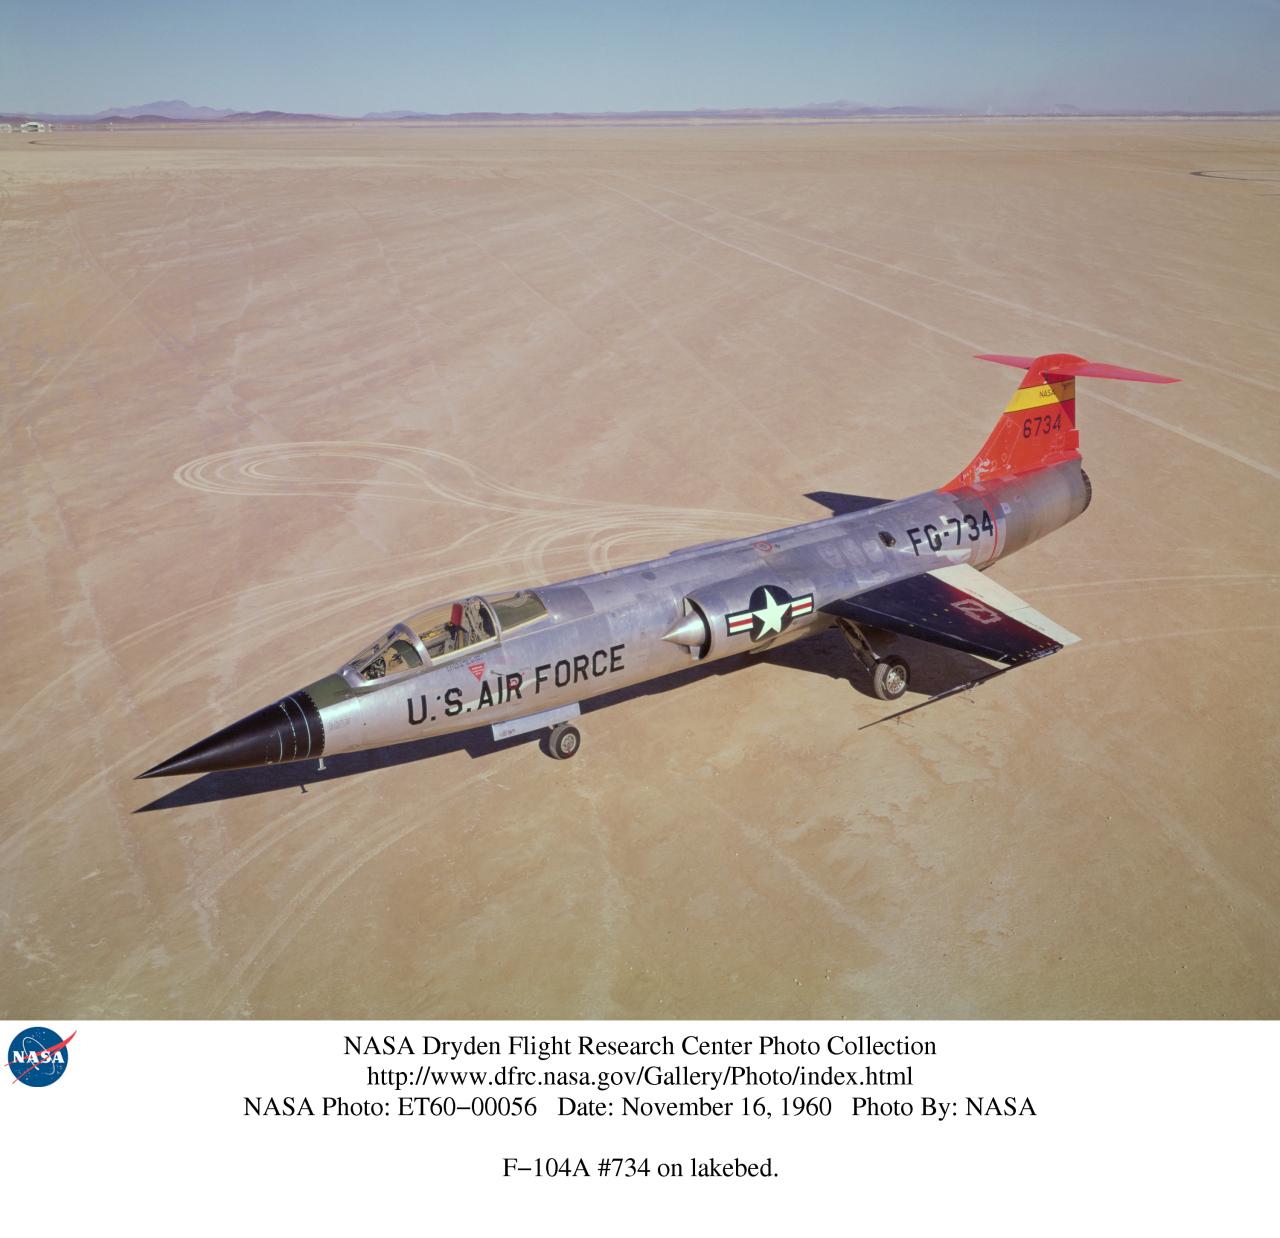 nasa f-104a - photo #8